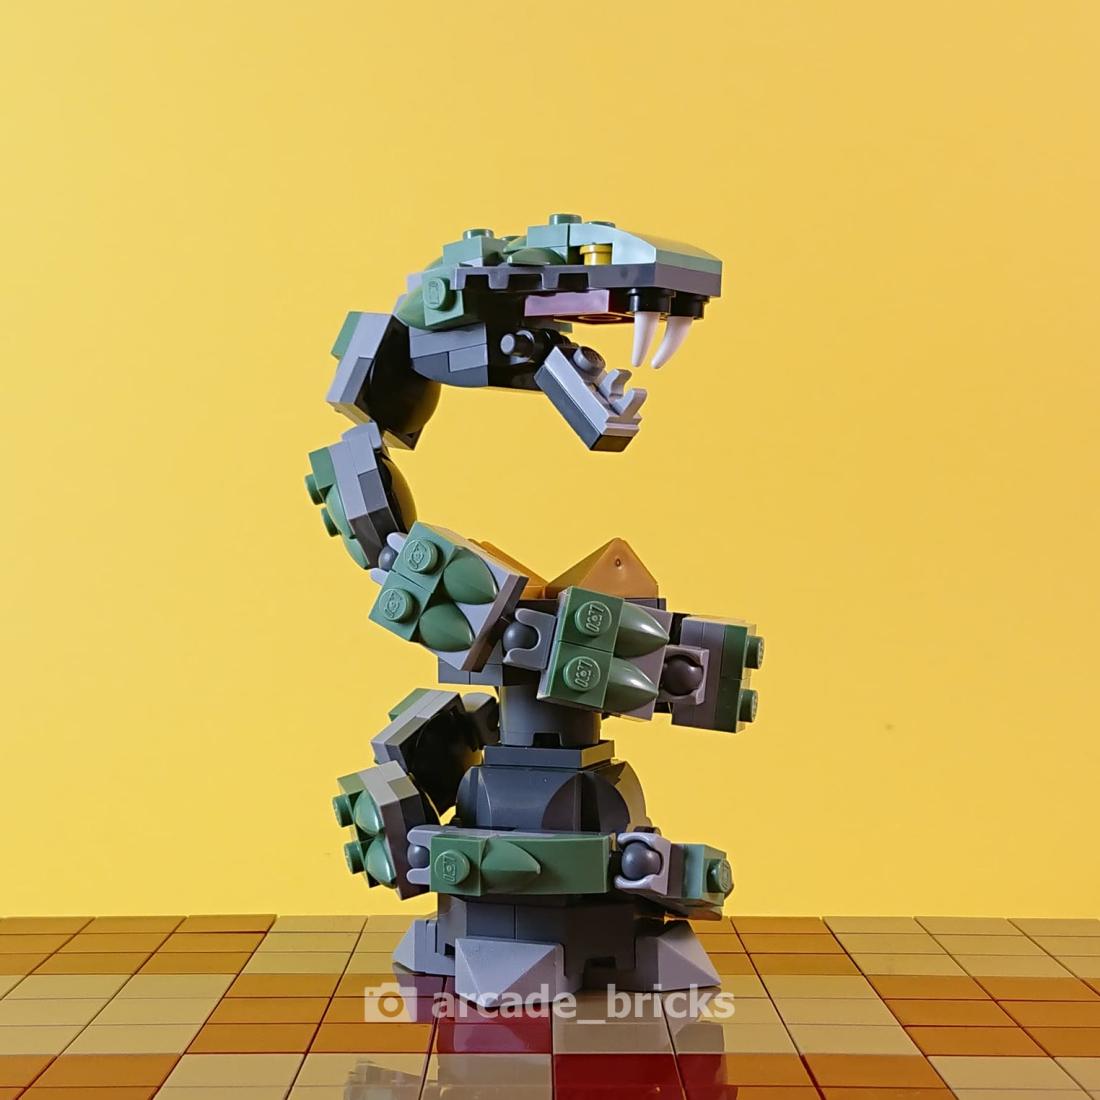 arcade_bricks_chess_evil_05_rook